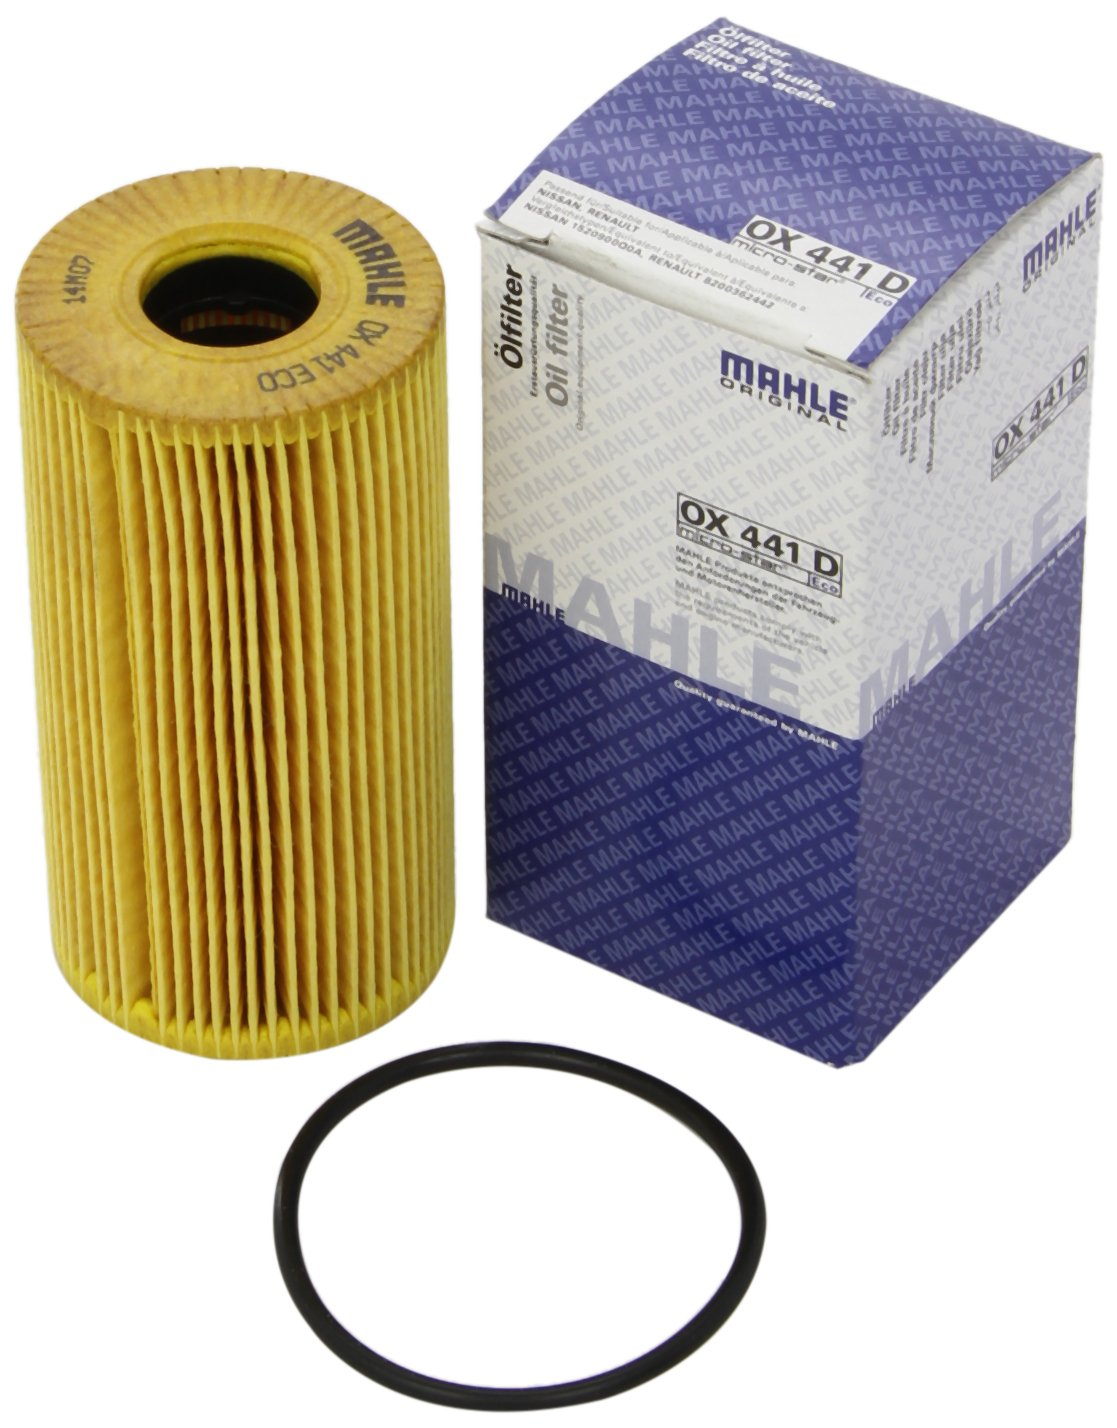 Mahle Filter OX441D Filtro De Aceite